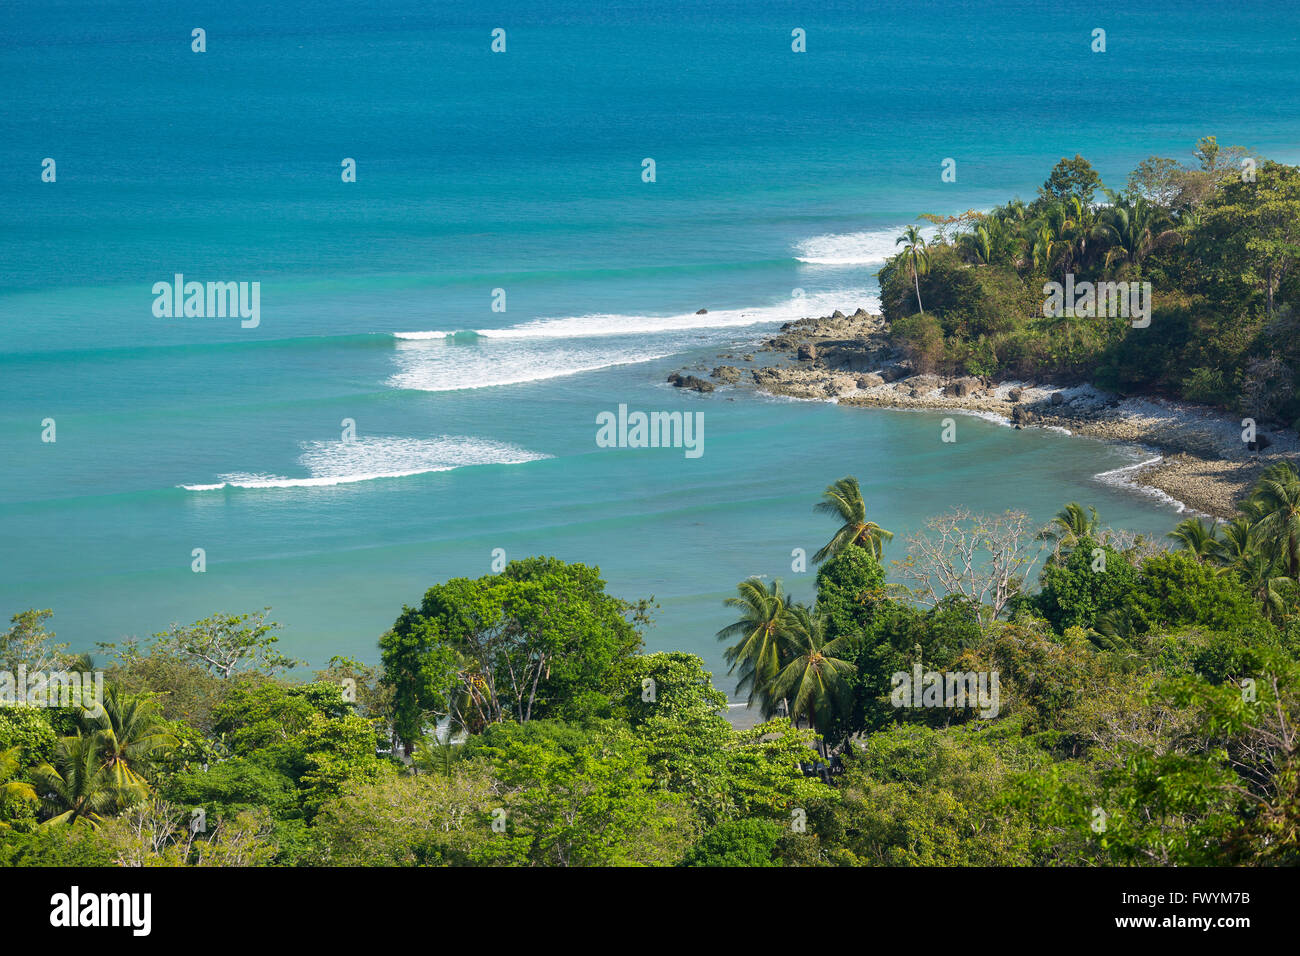 OSA PENINSULA, COSTA RICA - Pan Dulce beach and the Pacific Ocean. - Stock Image